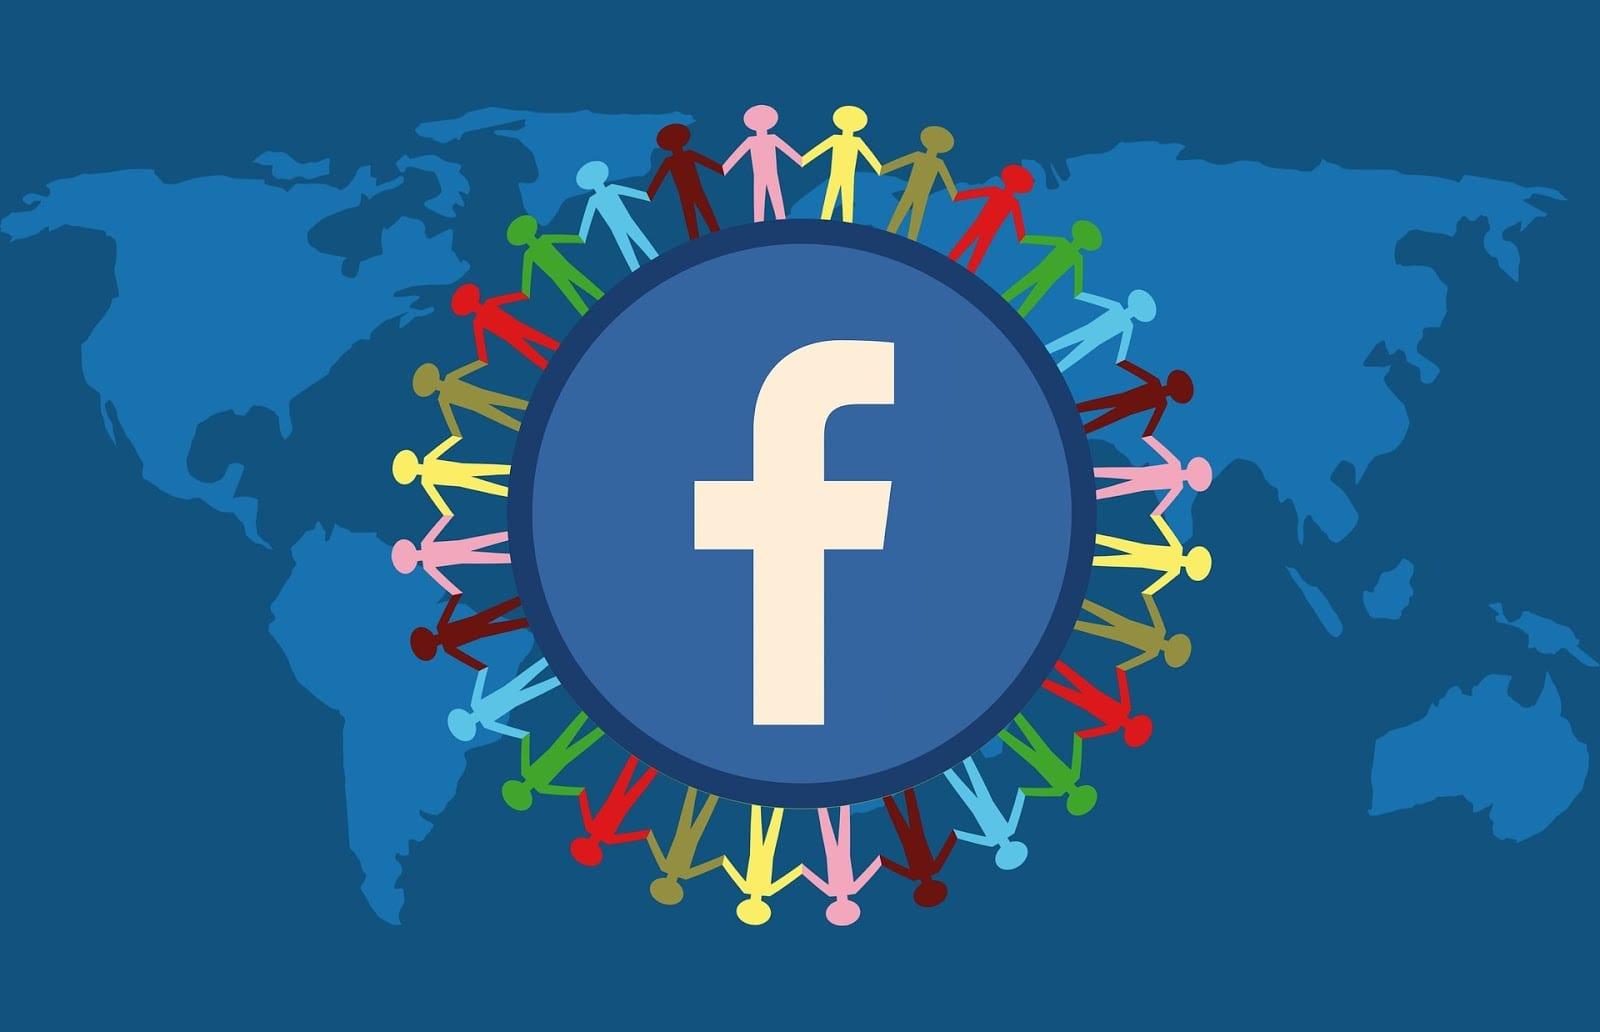 facebook 4540024 1920